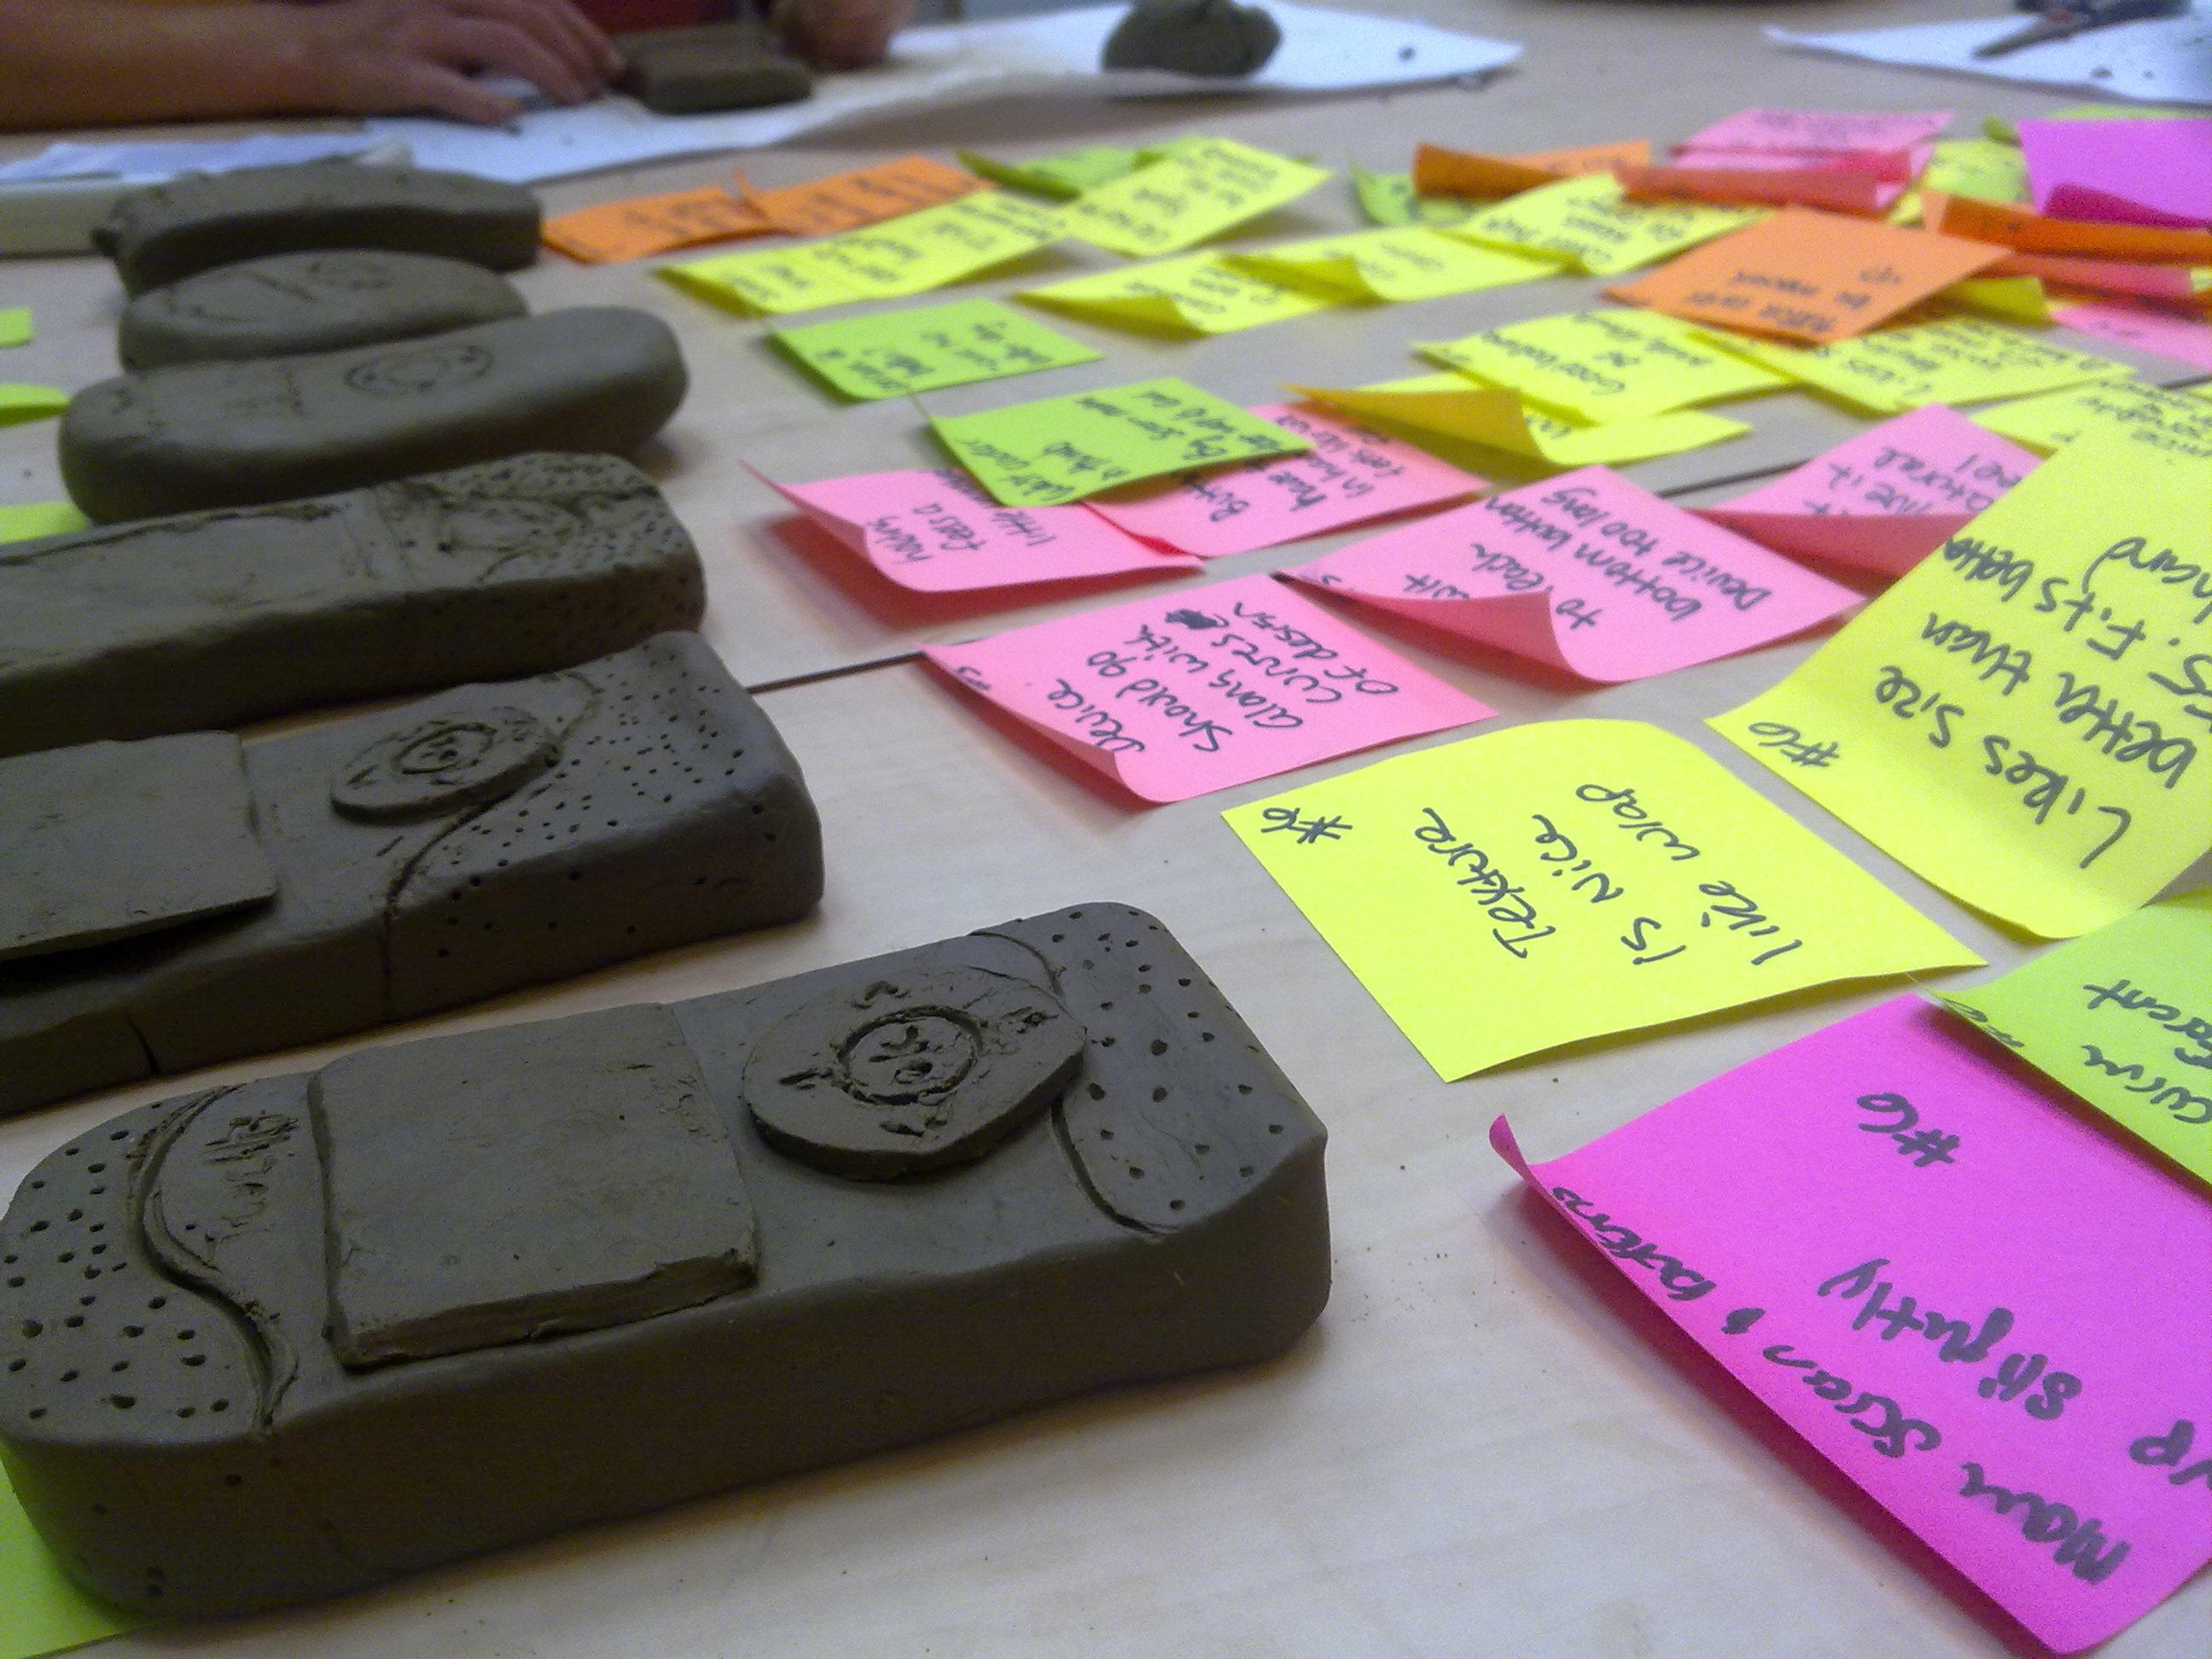 Clay models to test ergonomics